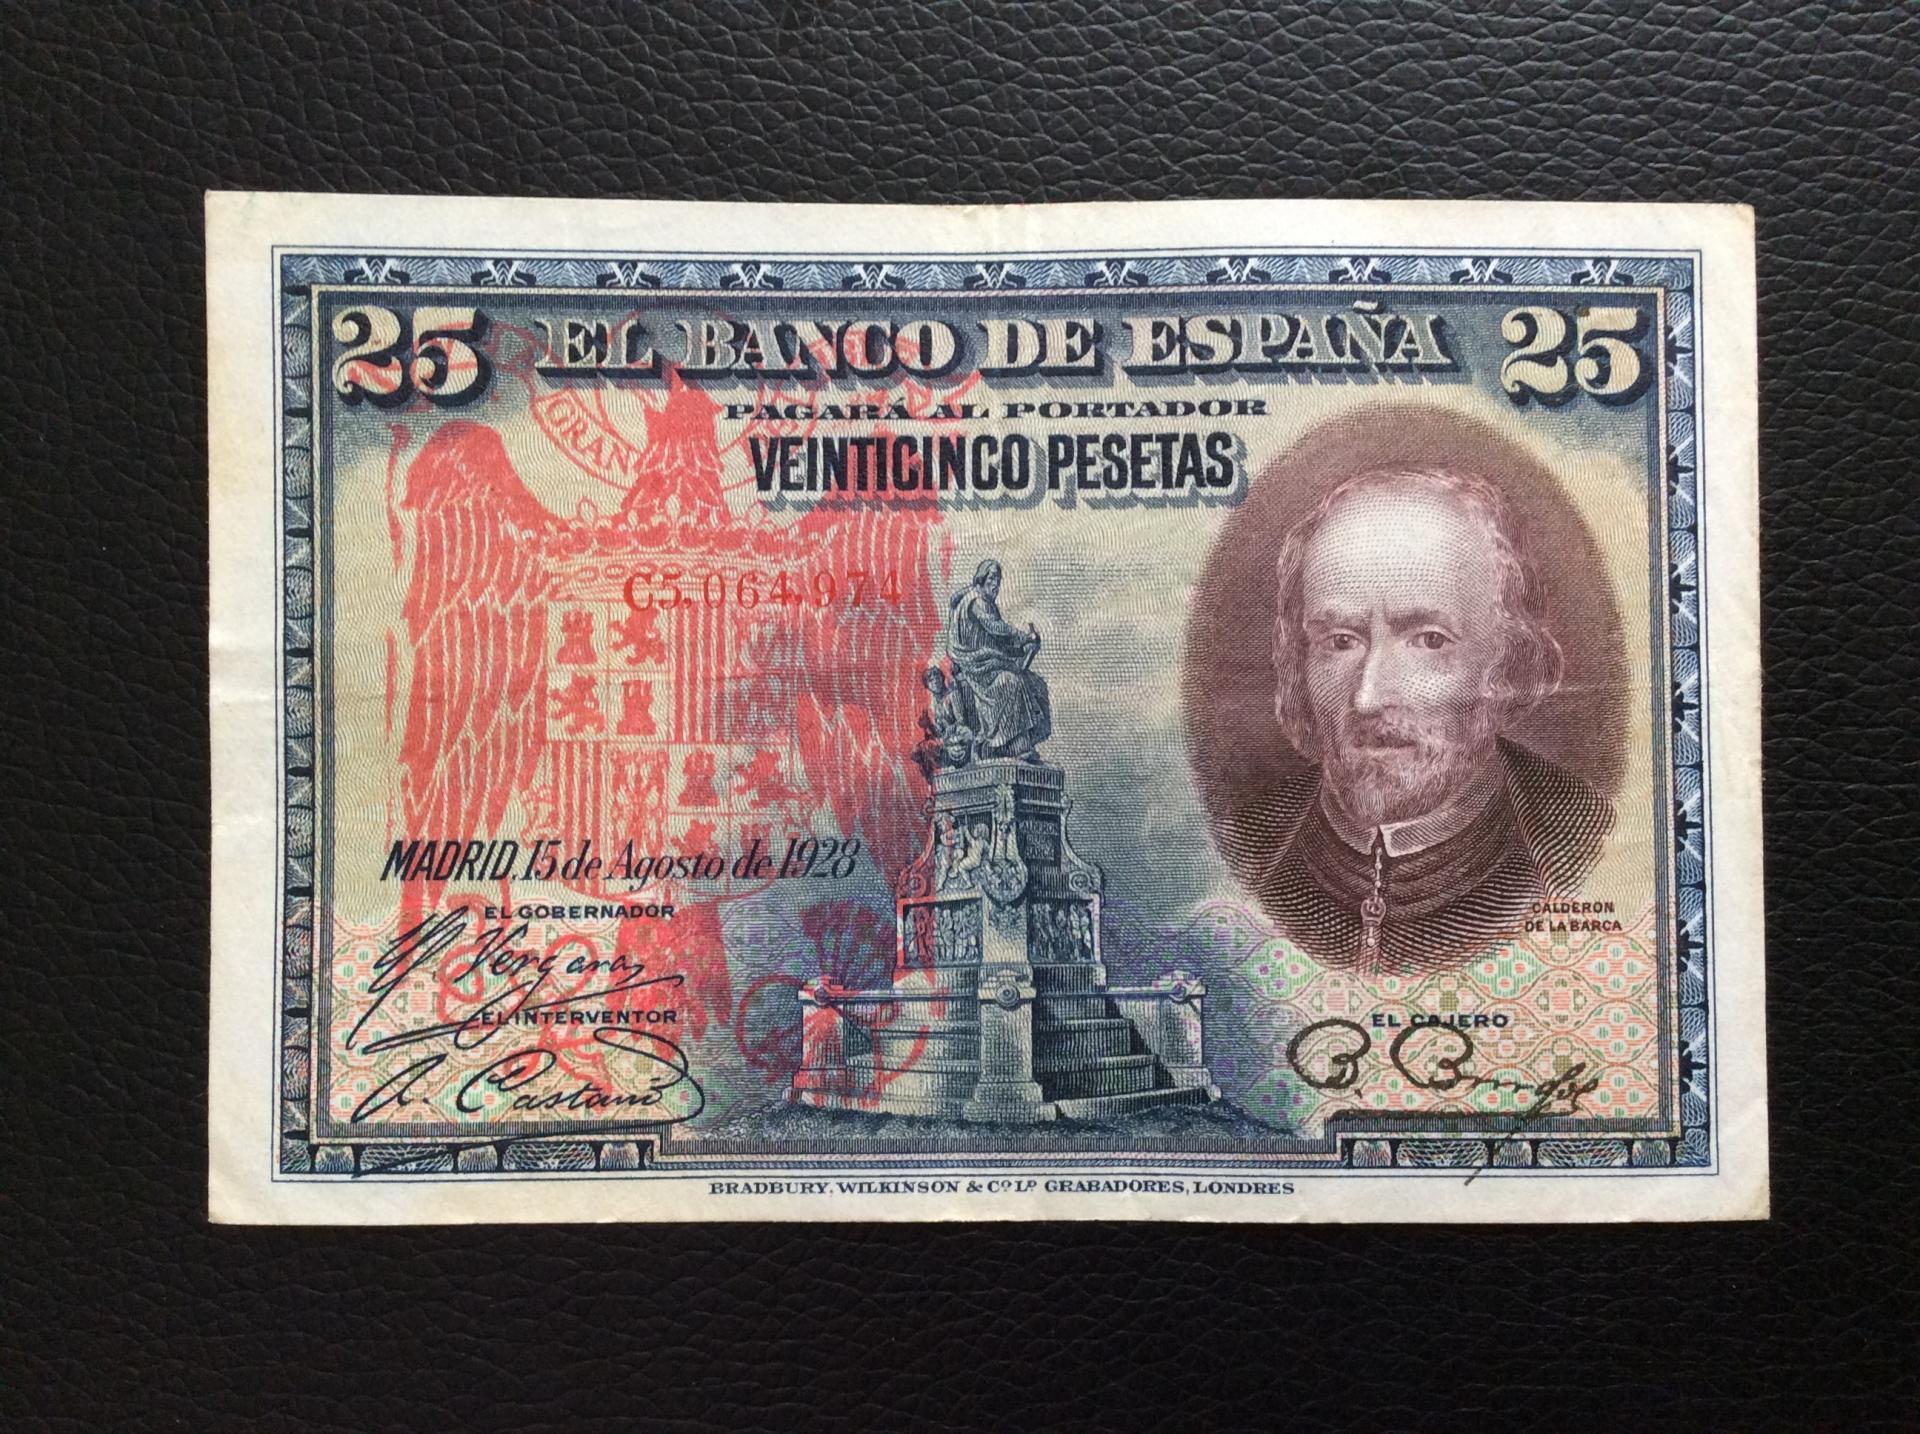 25 PESETAS 1928 - SELLO ROJO AGUILA DE SAN JUAN - CALDERÓN DE LA BARCA